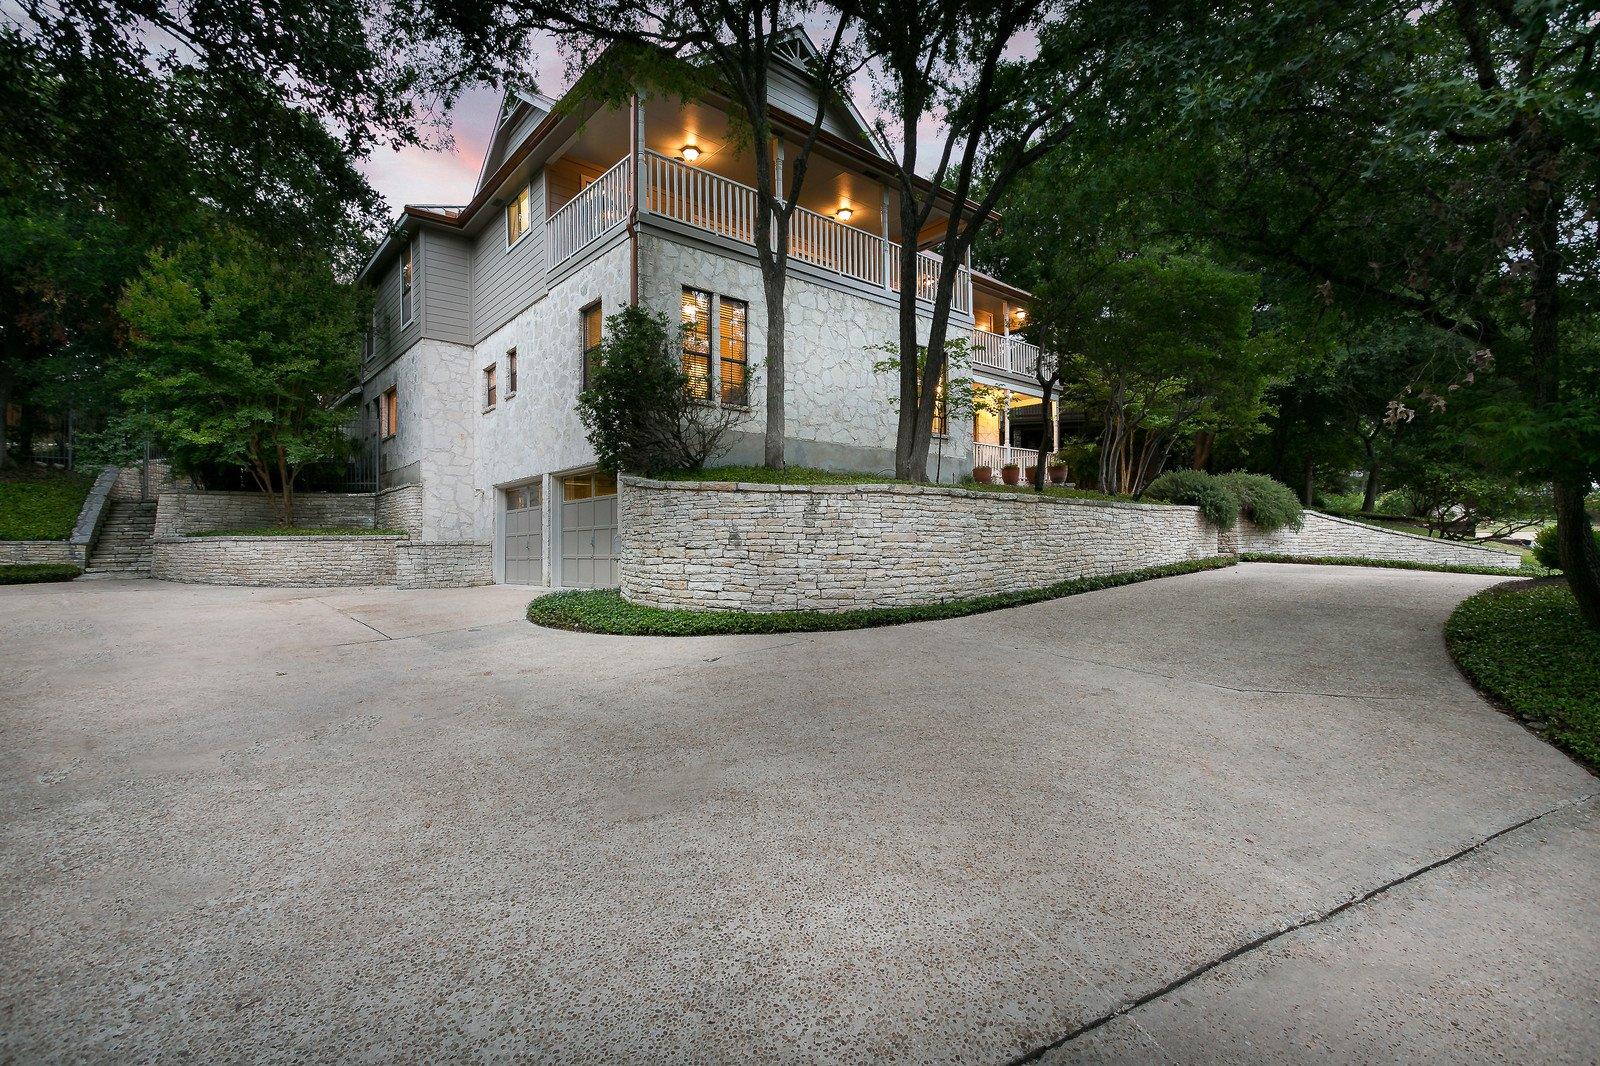 Home for sale San Antonio 611 Bluff Trail garage